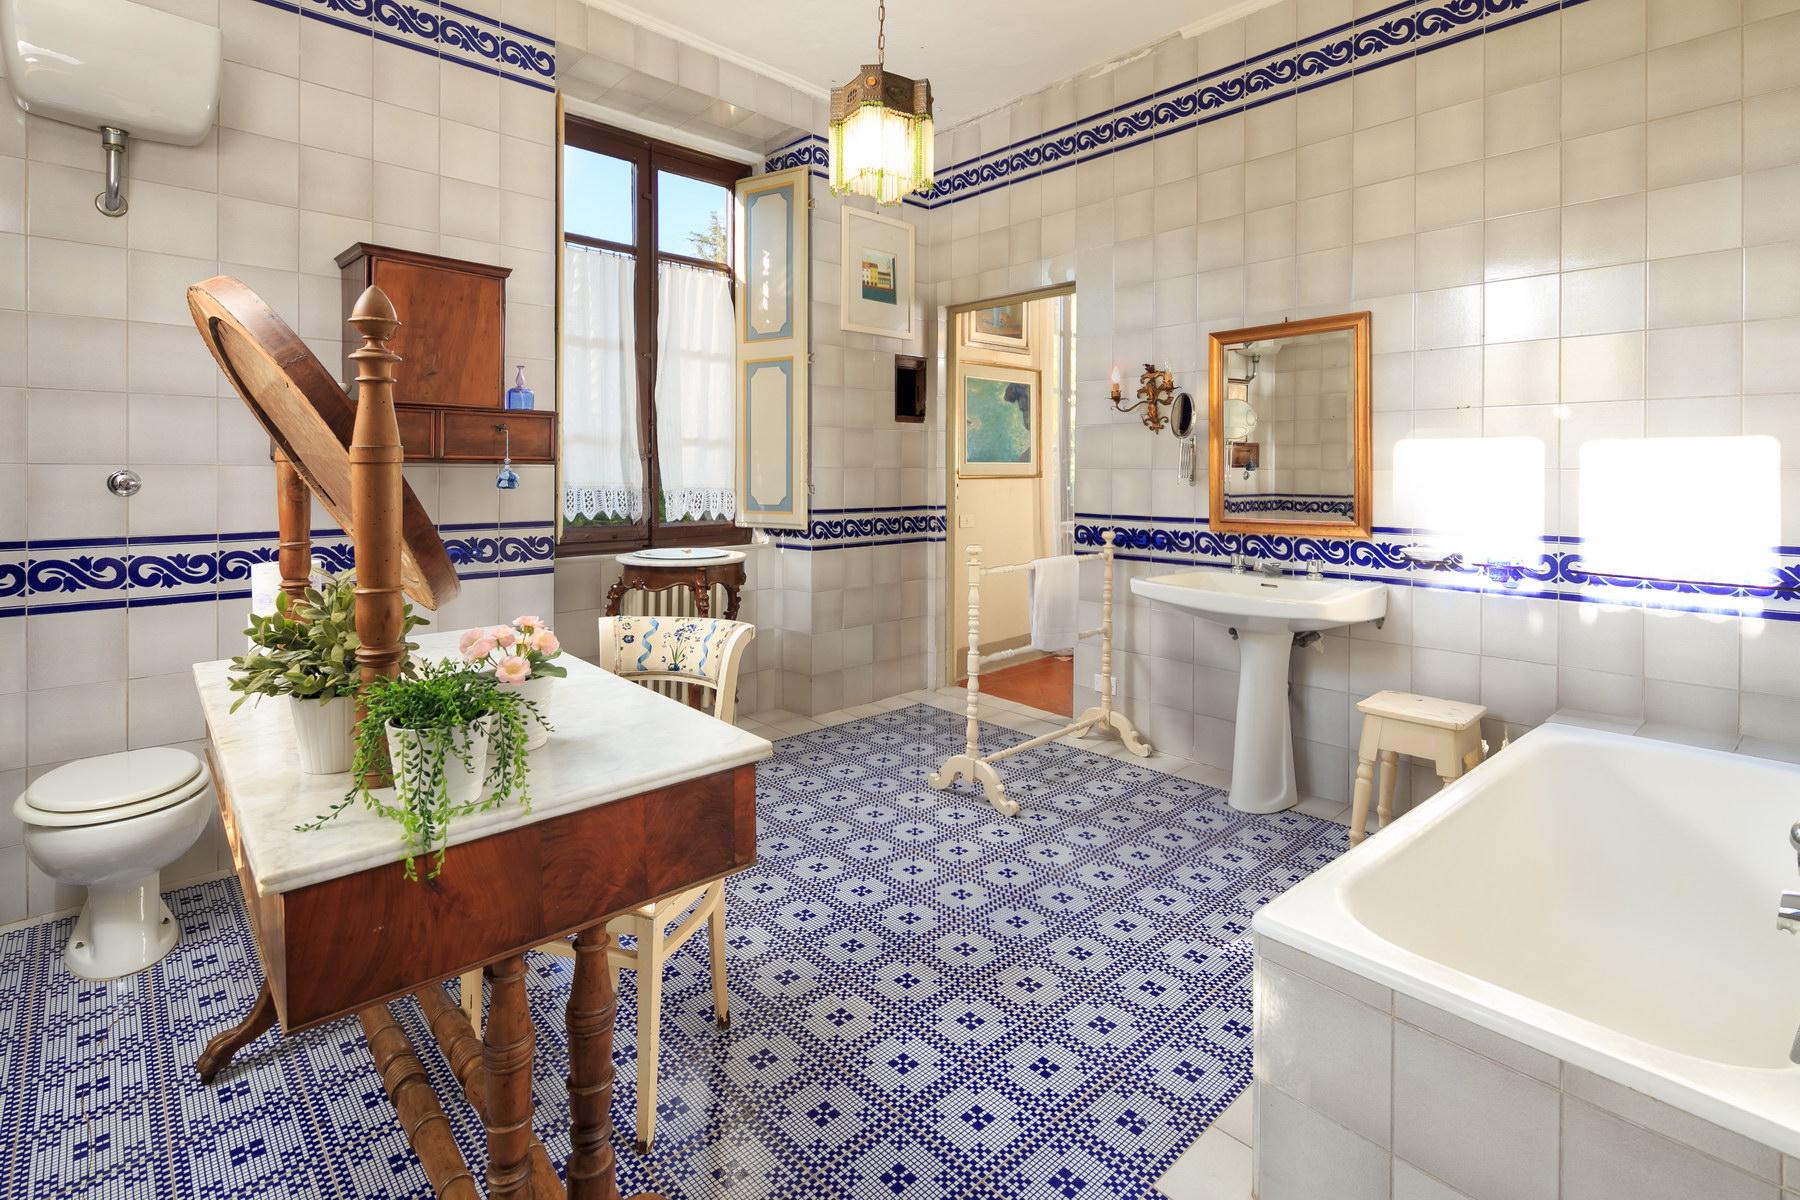 Villa in Vendita a Capannori: 5 locali, 570 mq - Foto 22